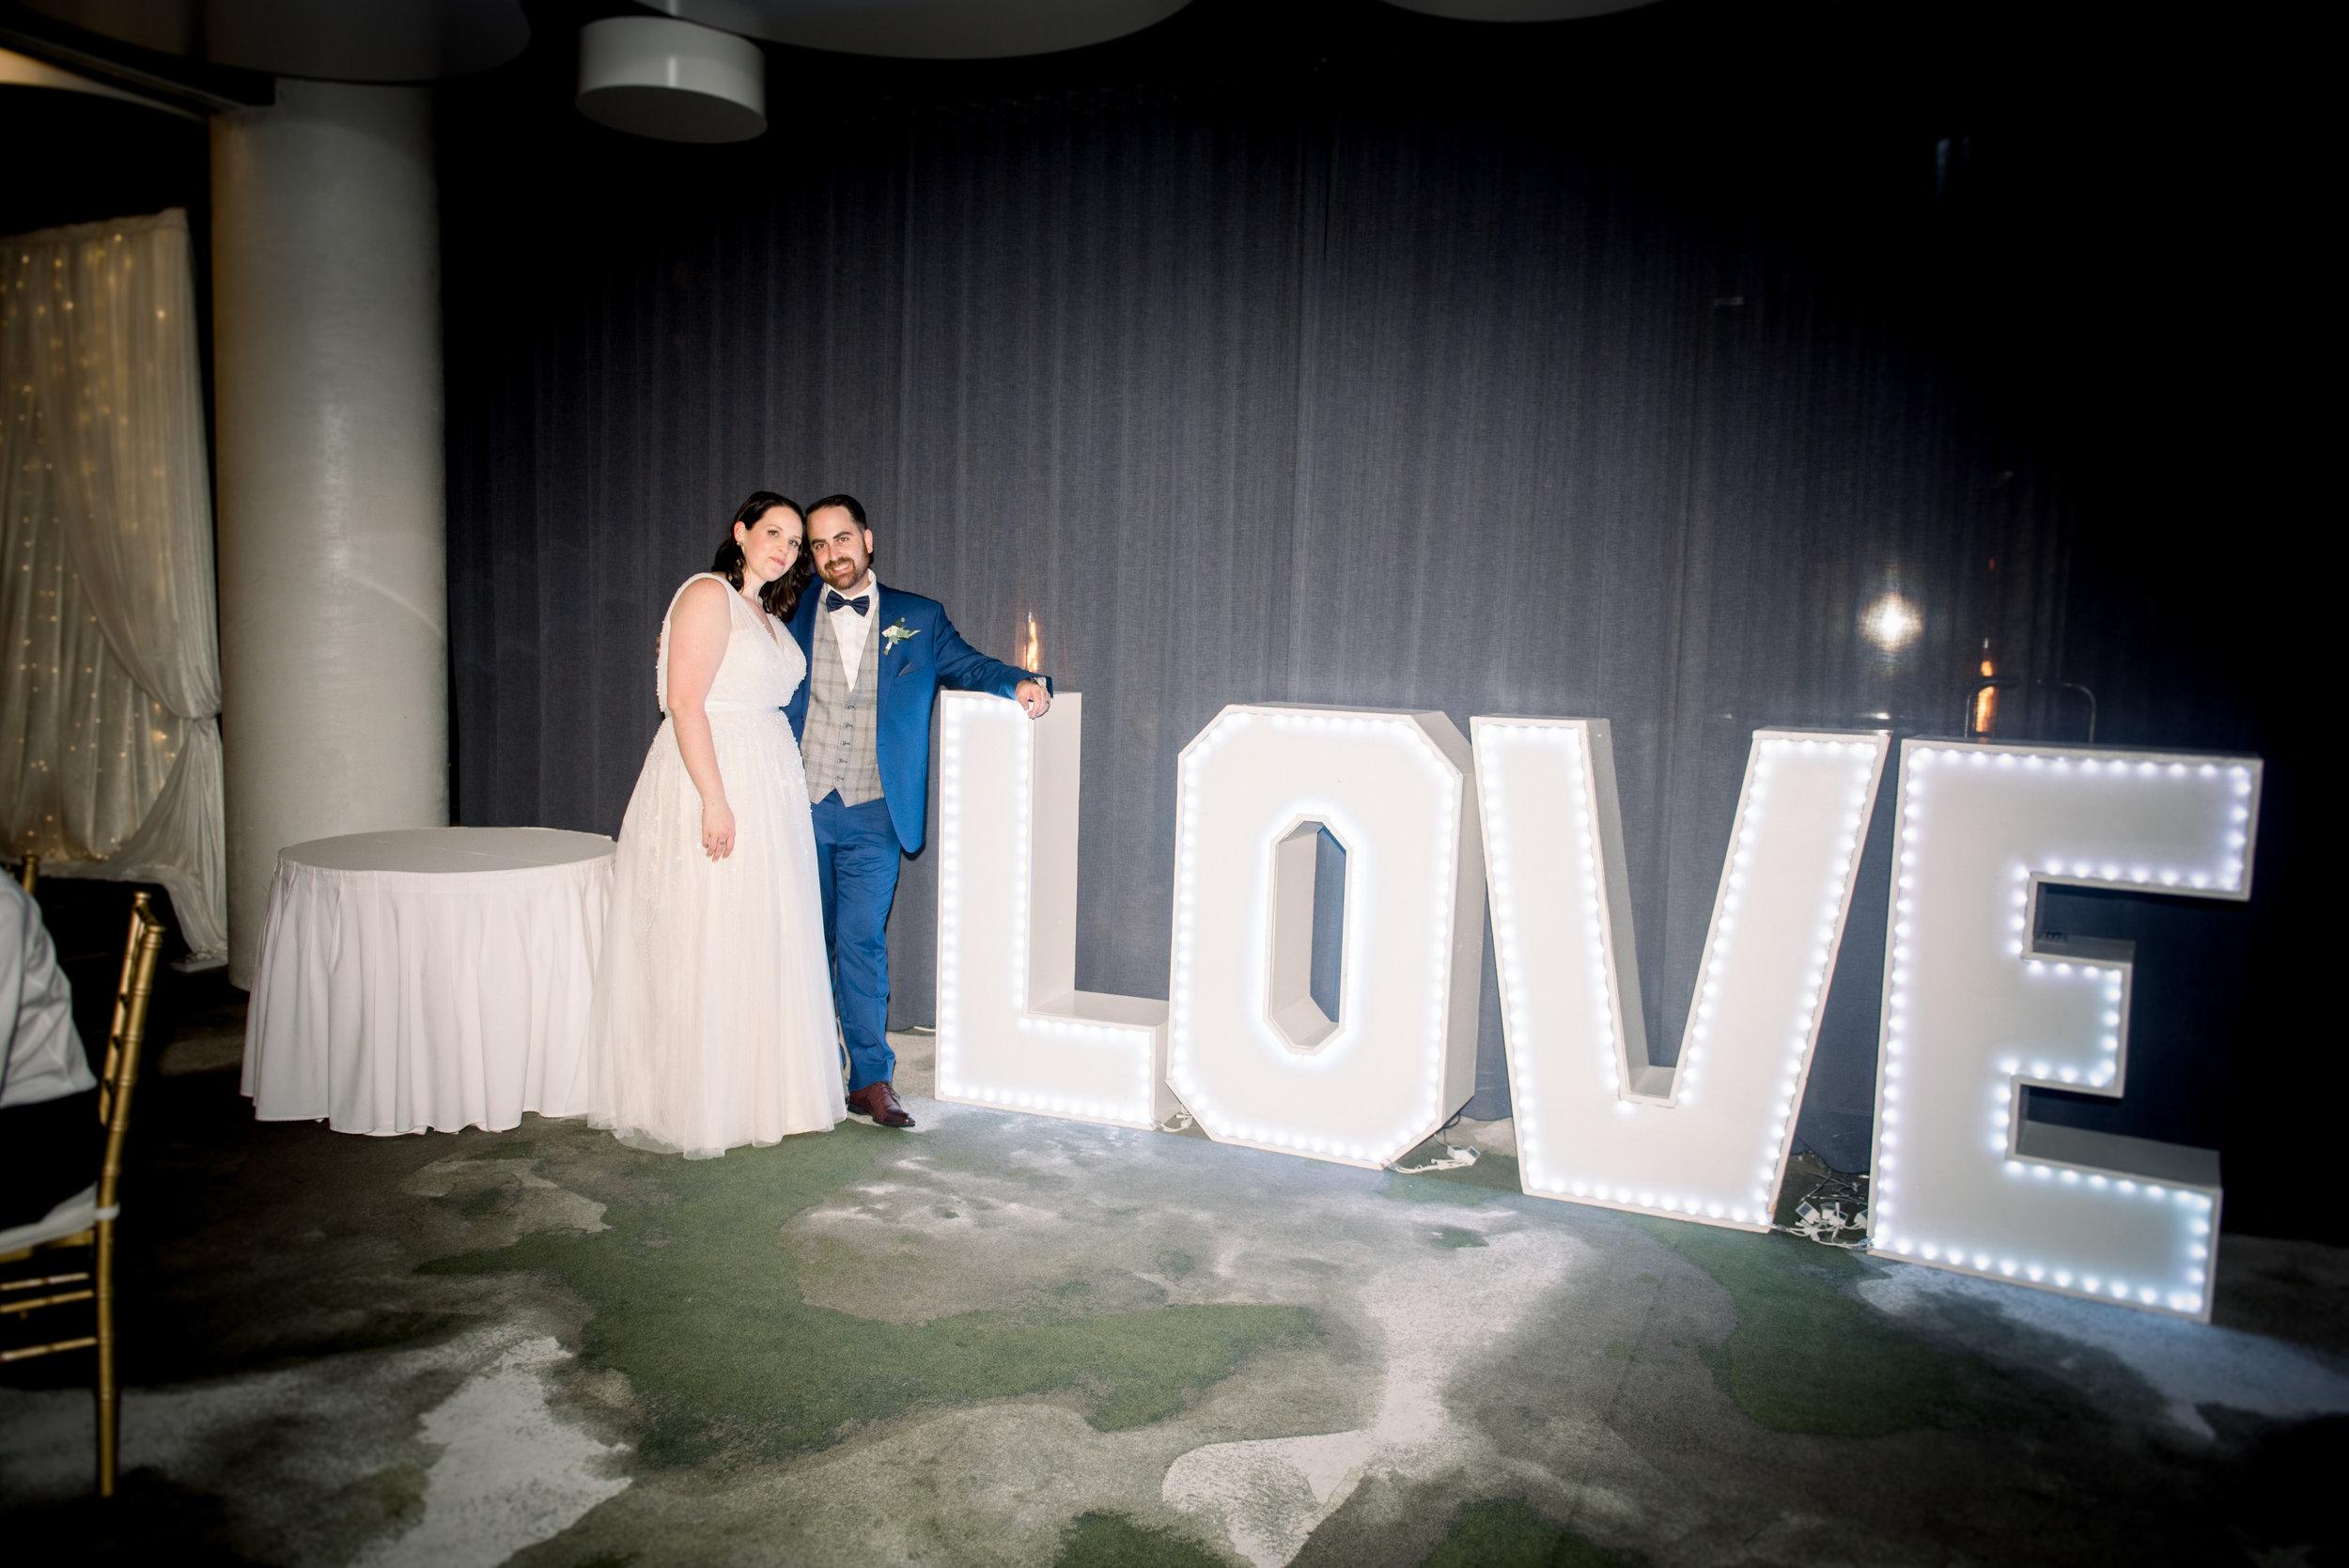 brisbane-city-wedding-photographer-romantic-wedding-135.jpg